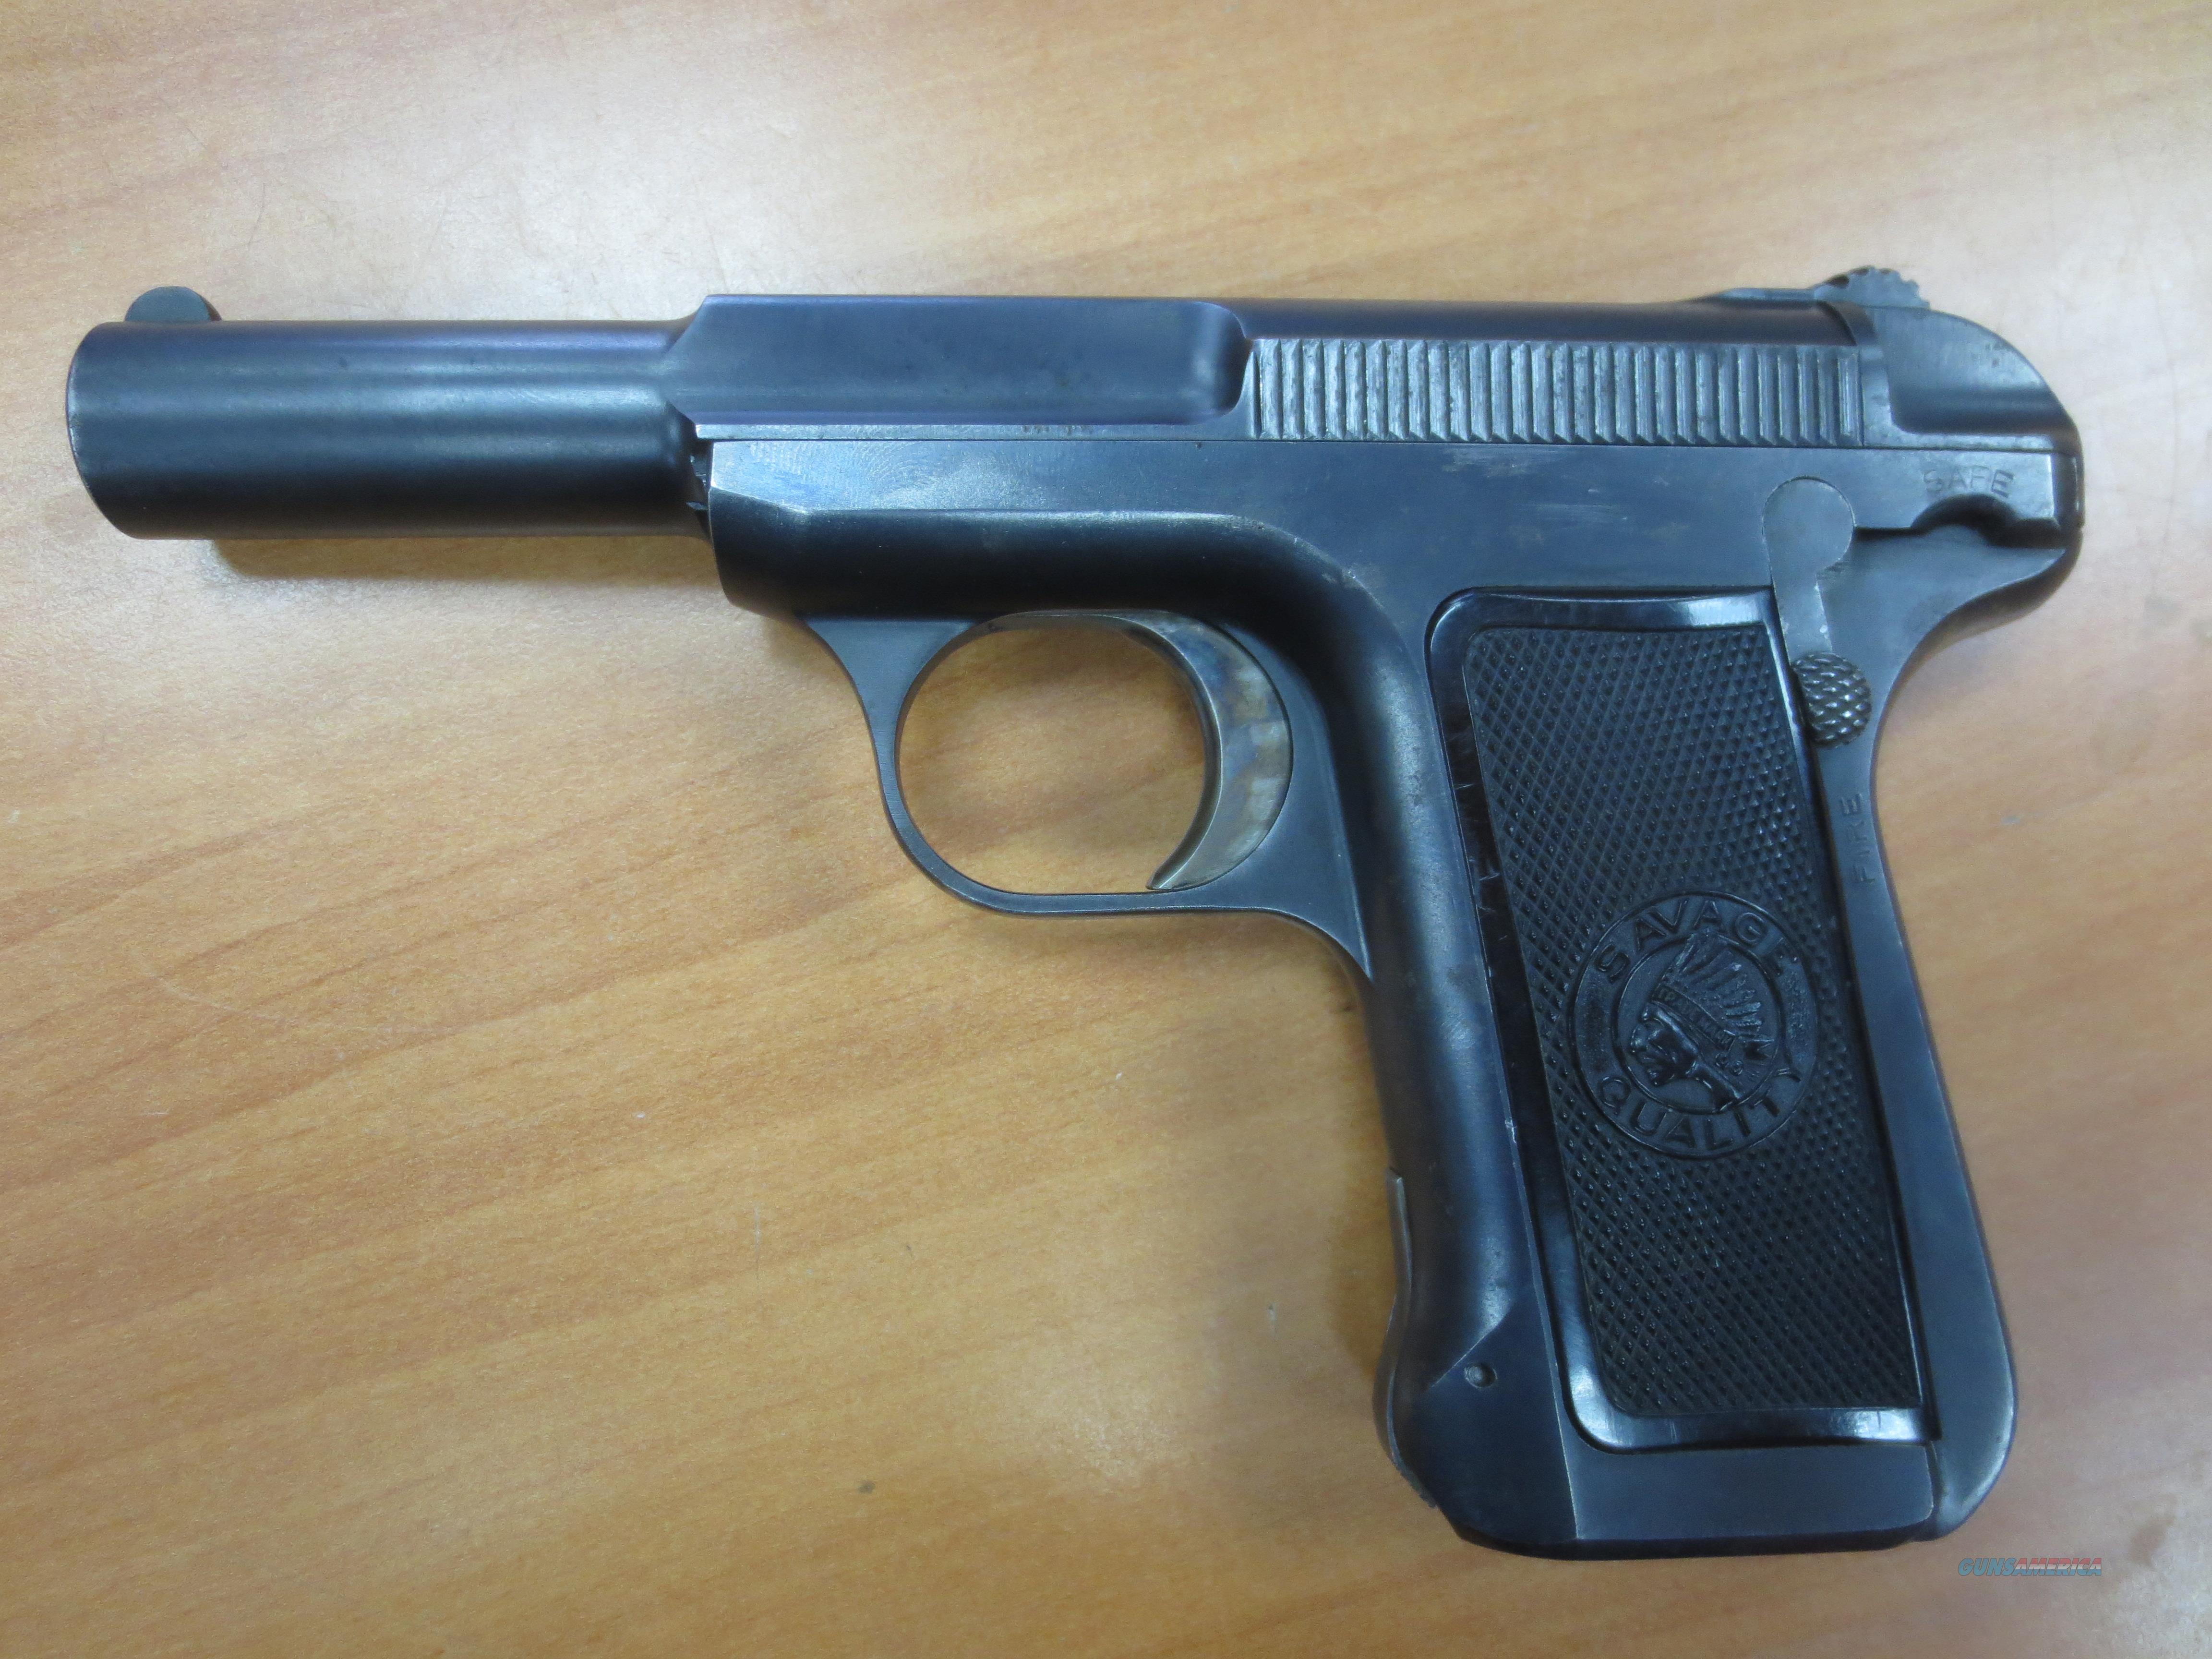 Savage arms mod#1905 pistol 32 cal 7.65mm  Guns > Pistols > Savage Pistols